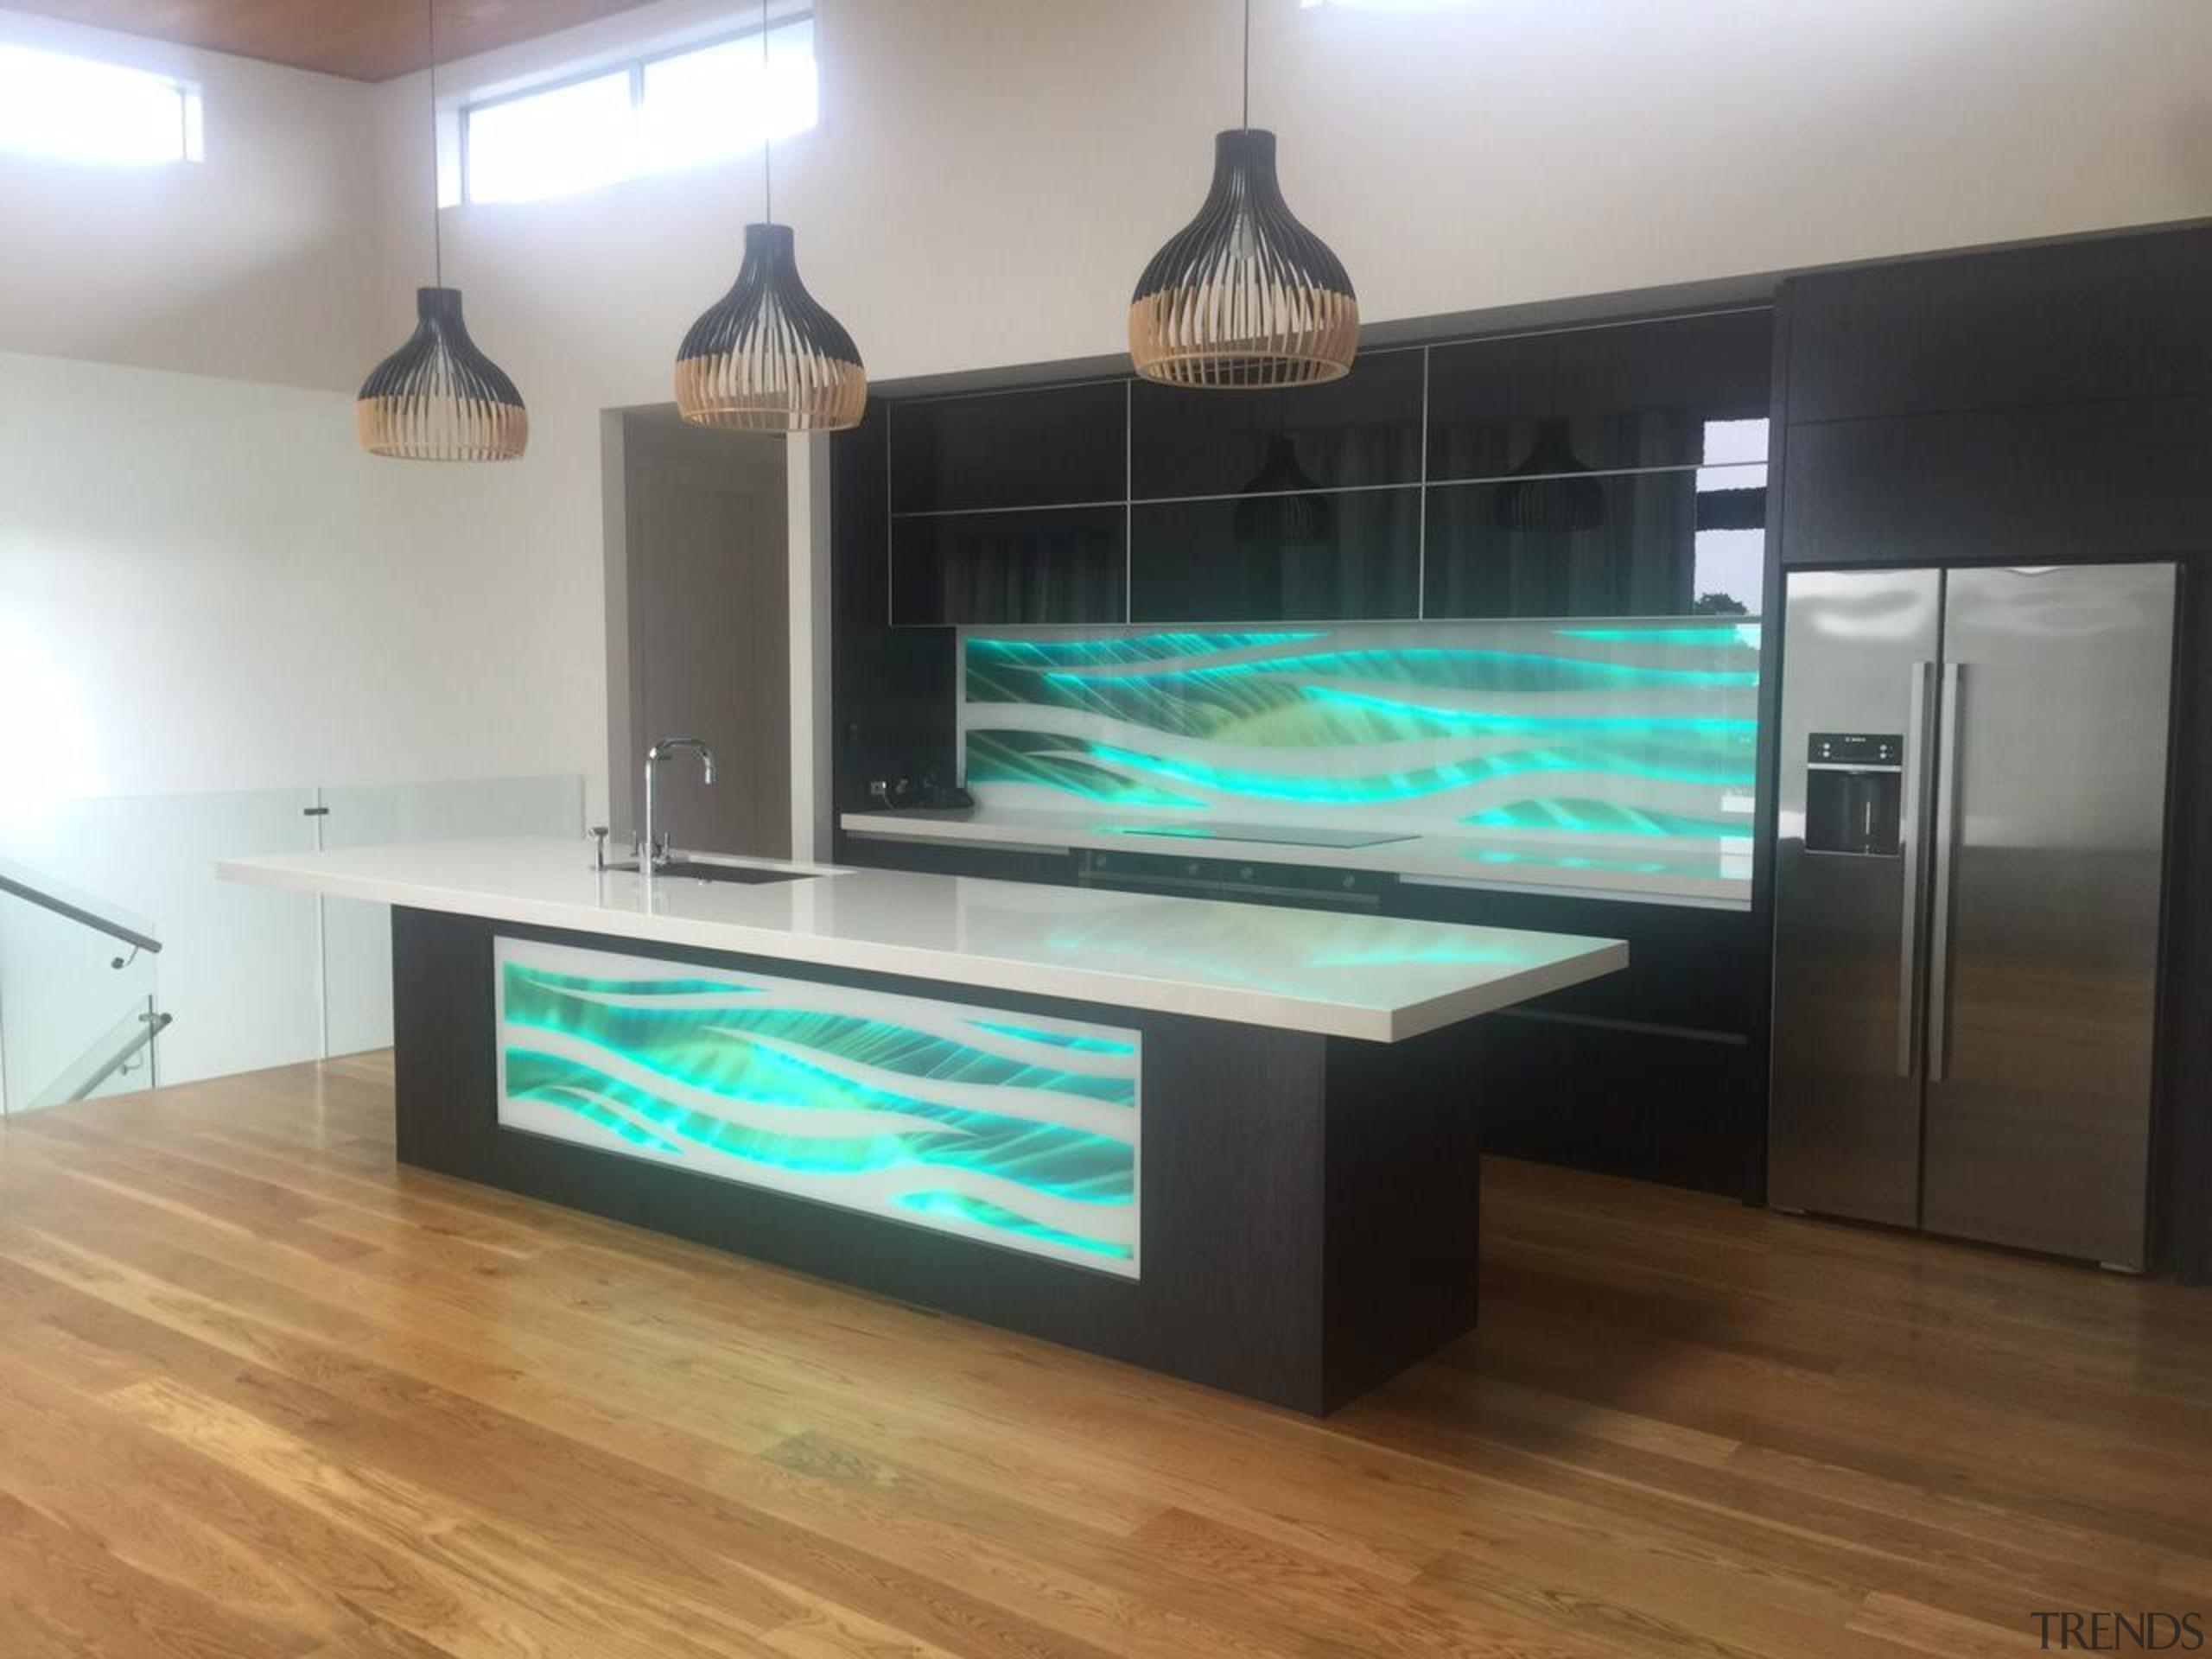 Colourful glass splashbacks create a dynamic backdrop in floor, flooring, furniture, glass, interior design, table, gray, black